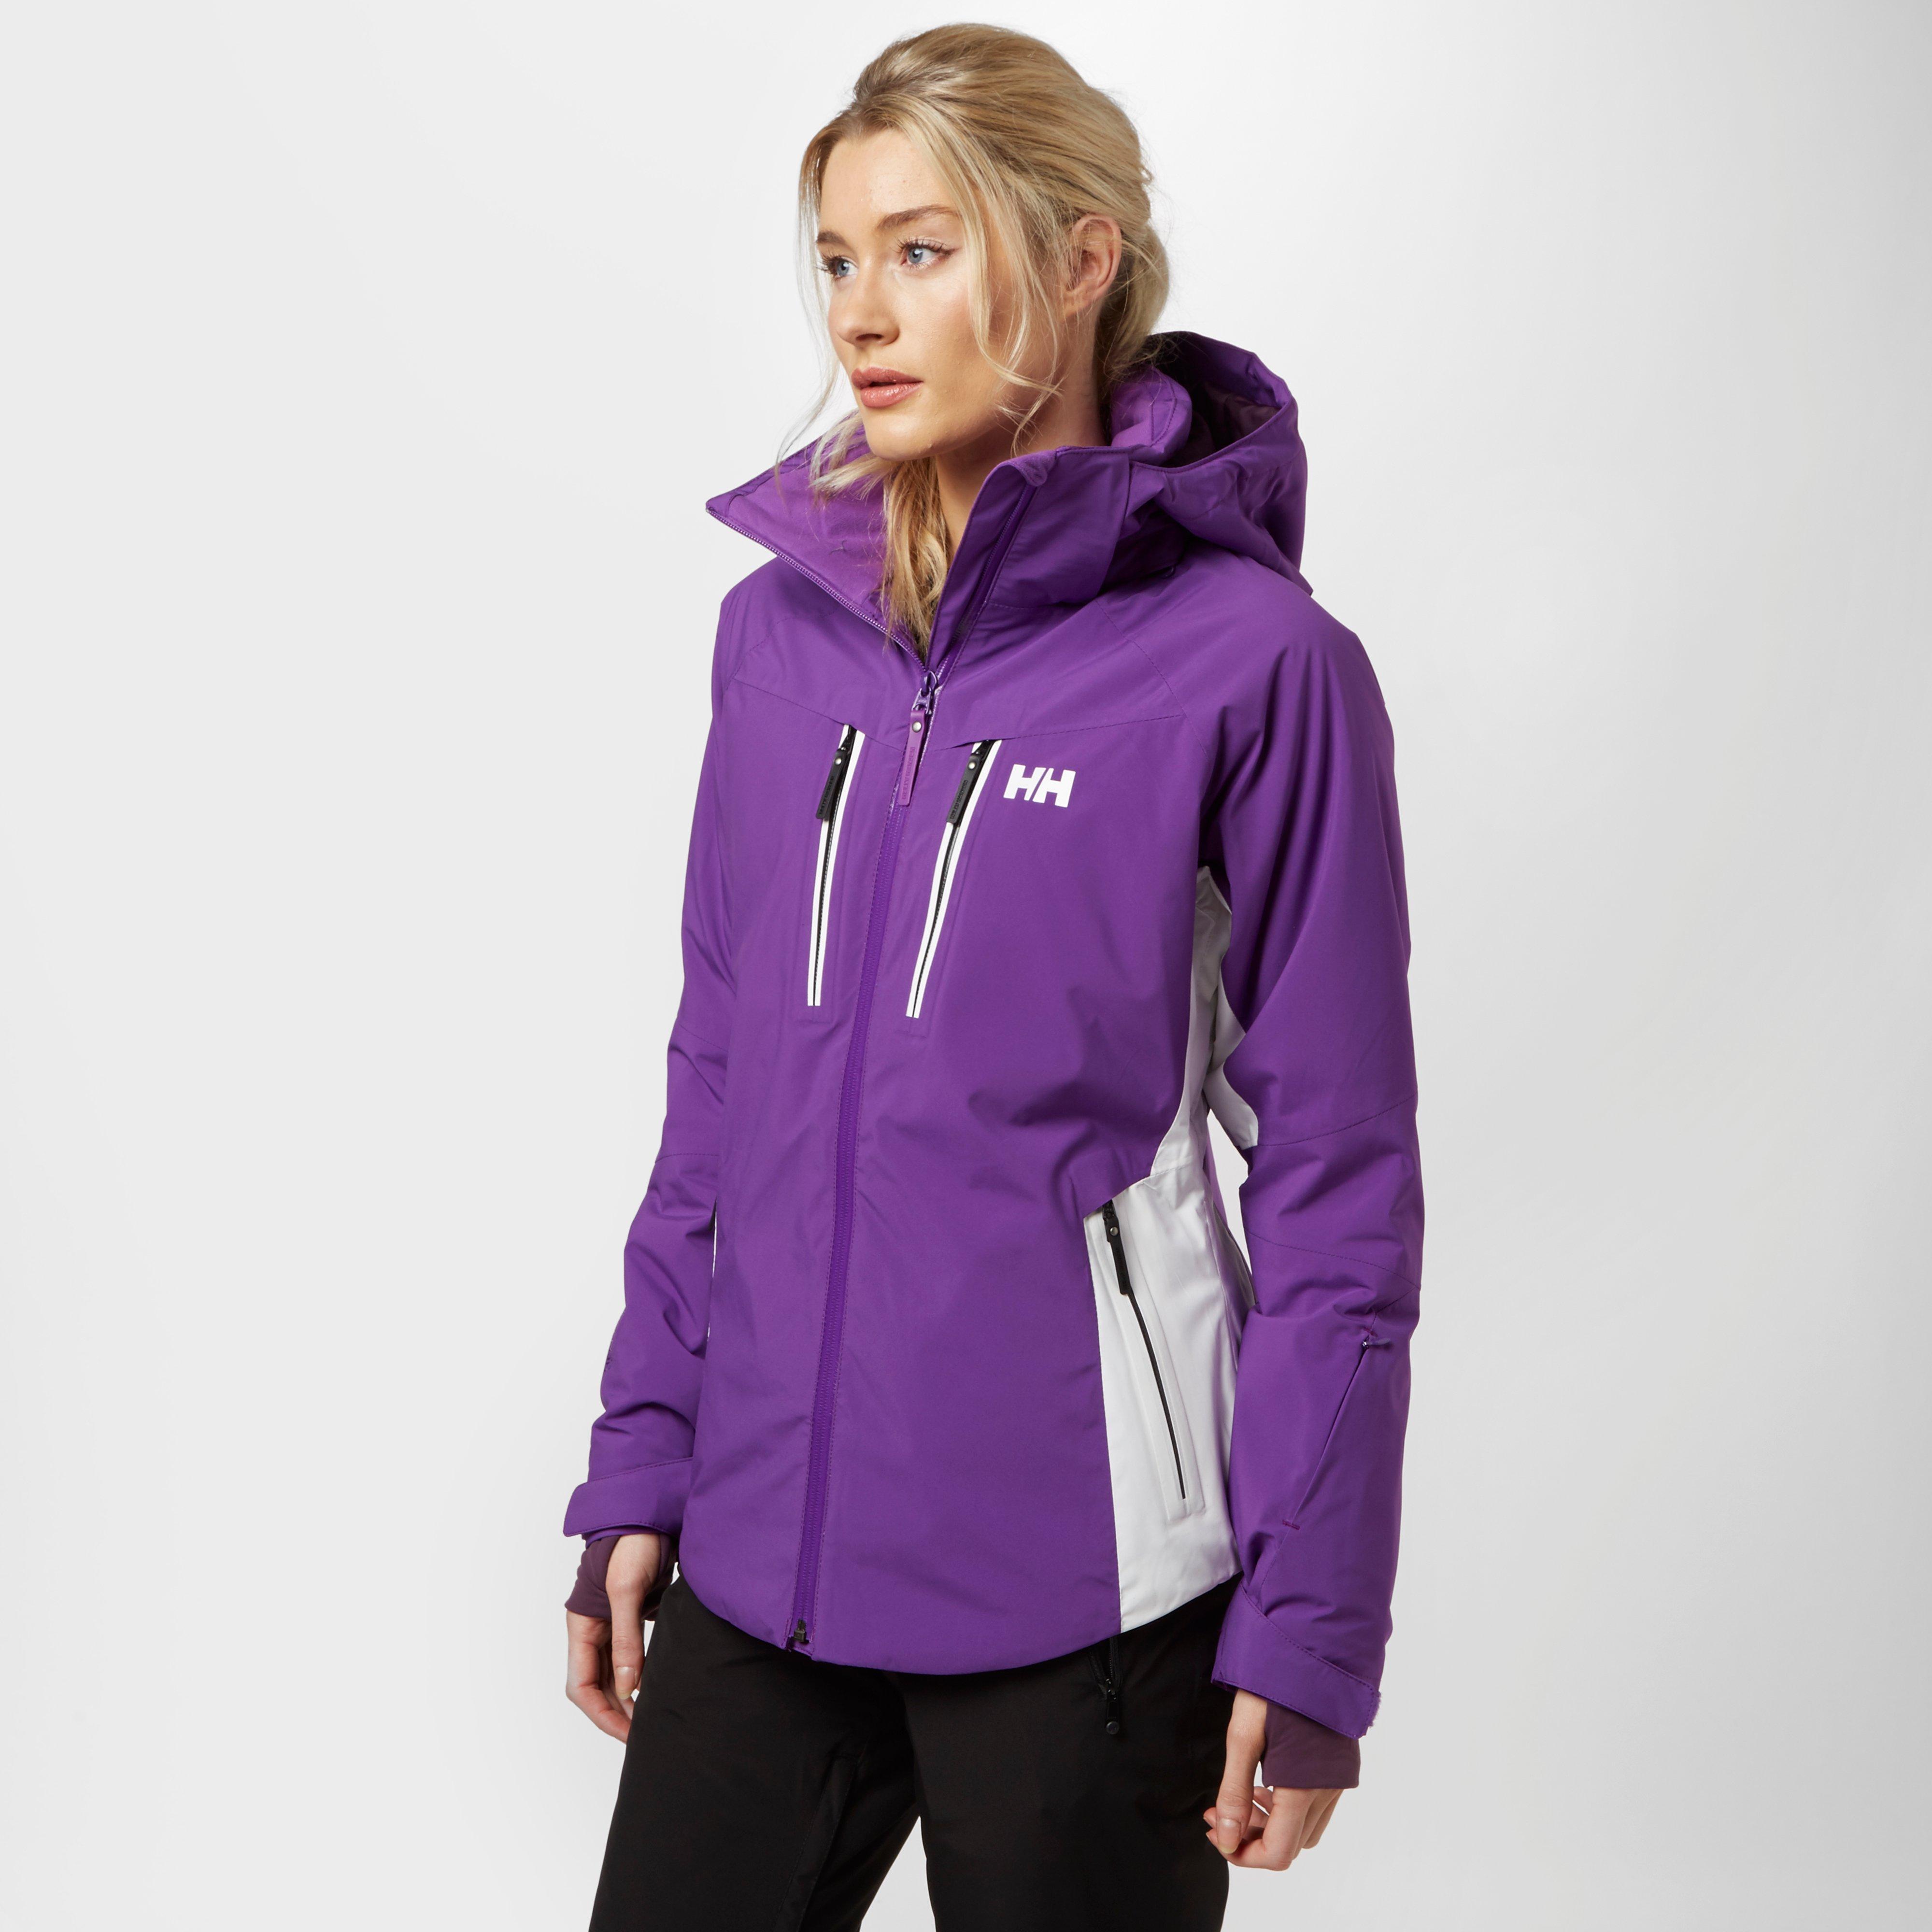 Helly Hansen Womens Motion Stretch Ski Jacket Purple